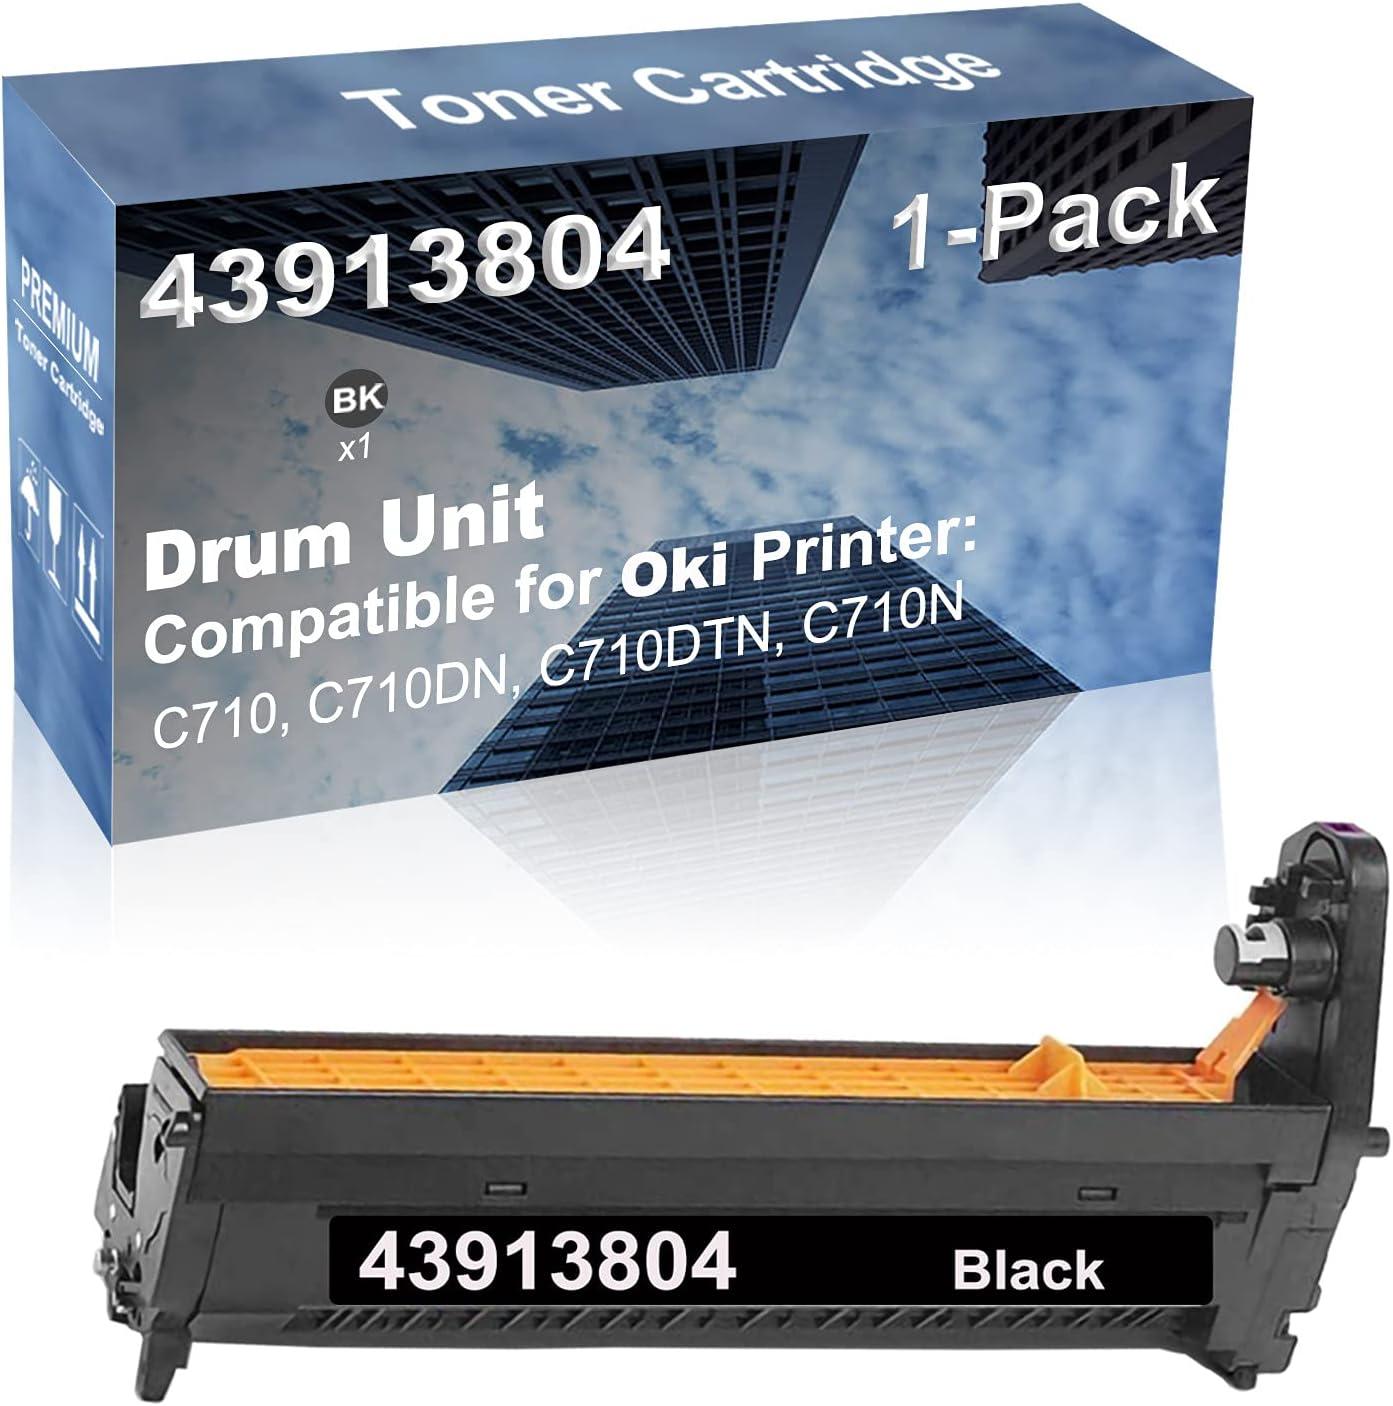 1-Pack (Black) Compatible C710, C710DN, C710DTN, C710N Printer Drum Kit High Capacity Replacement for Oki 43913804 Drum Unit